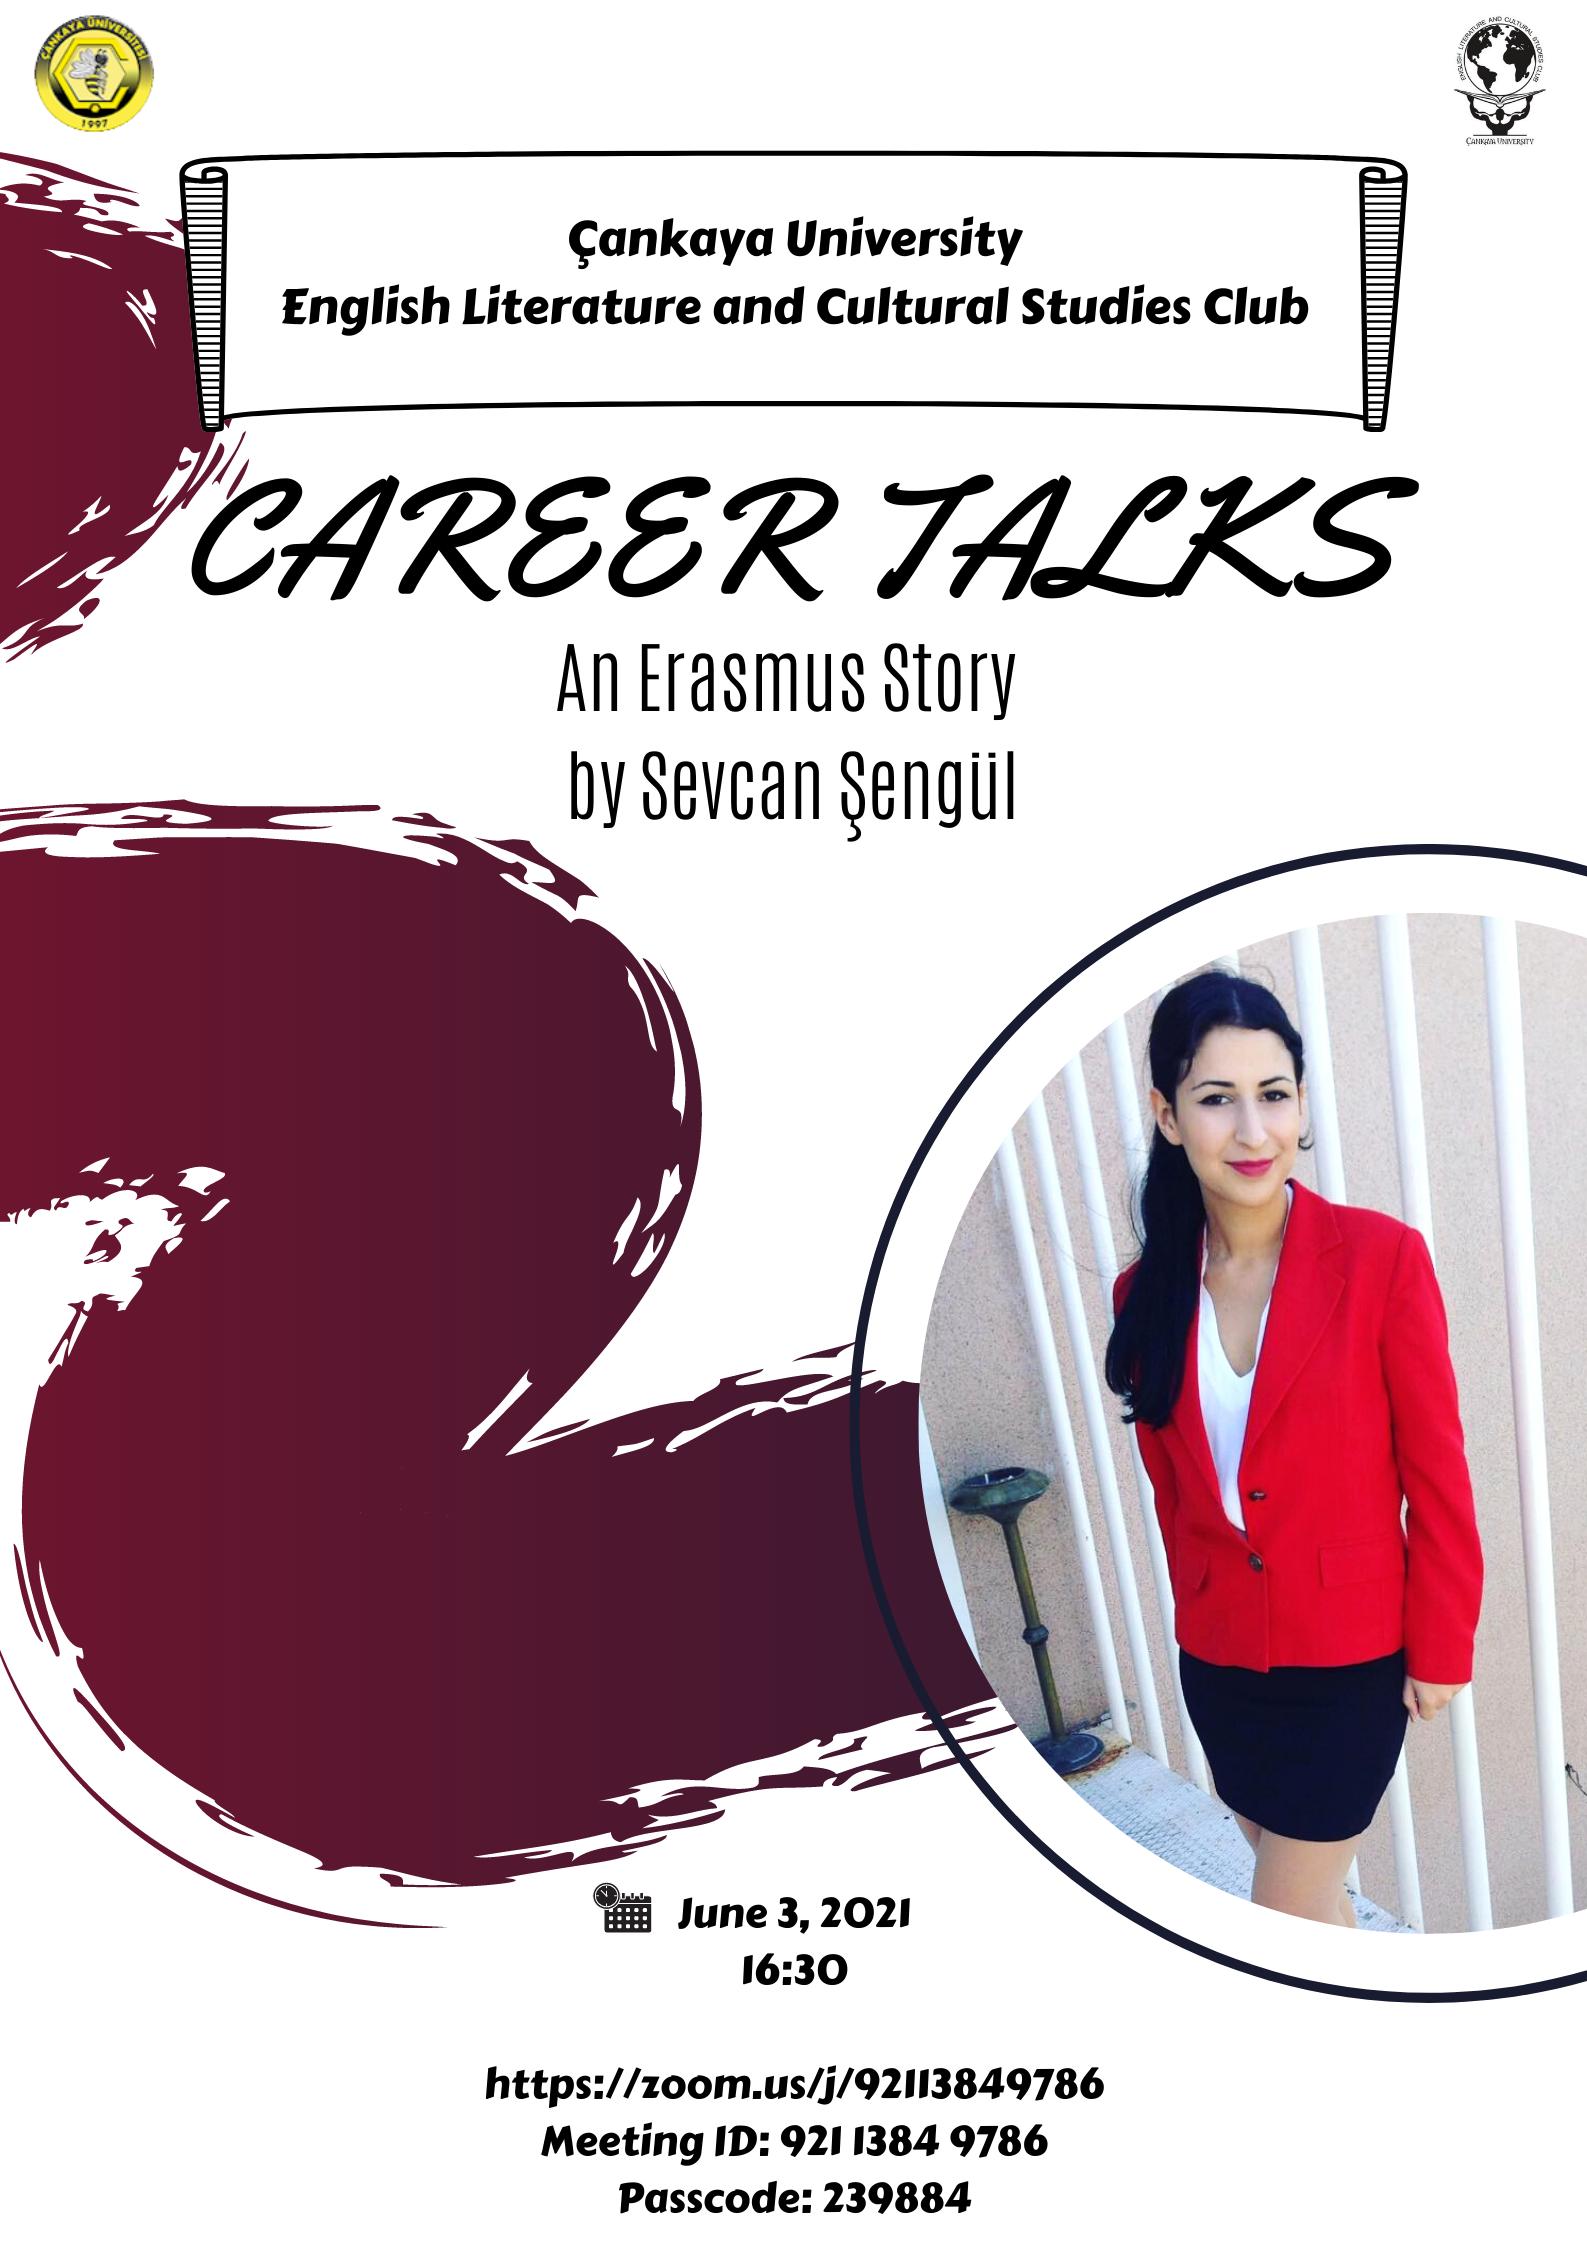 Career Talks: An Erasmus Story by Sevcan Şengül